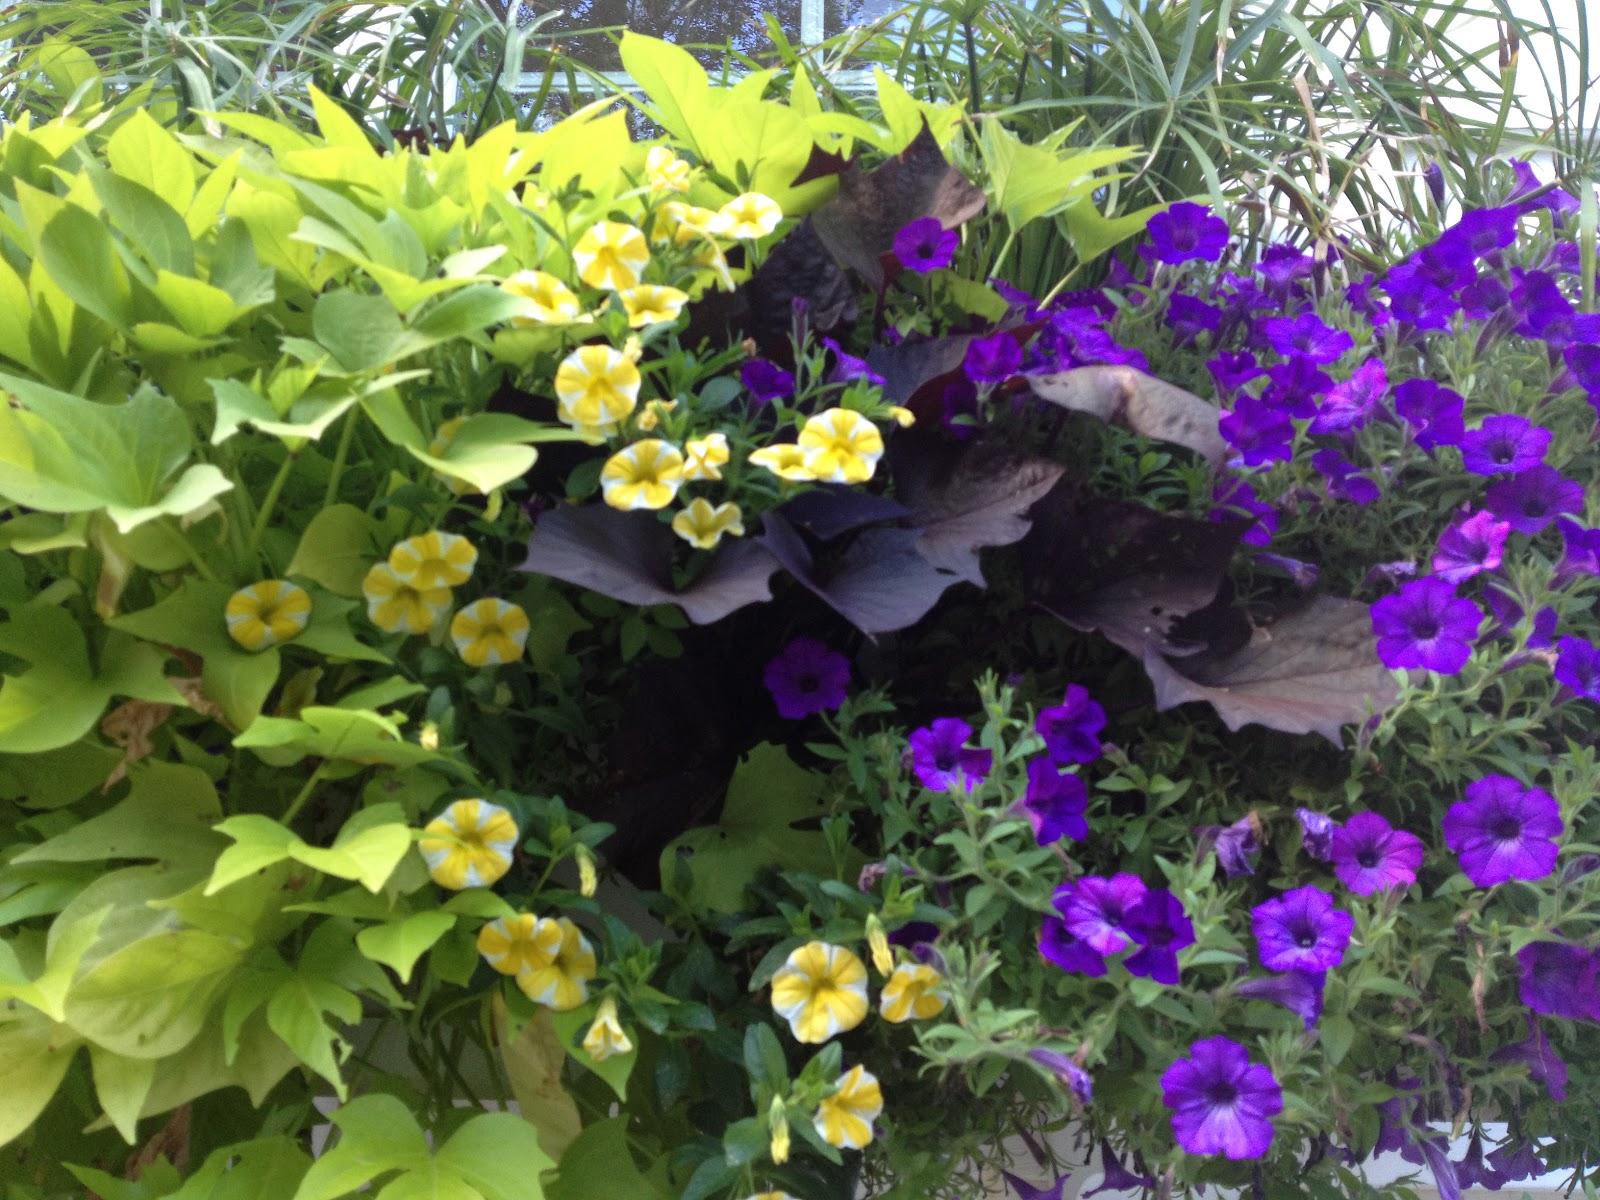 The Impatient Gardener Window box success